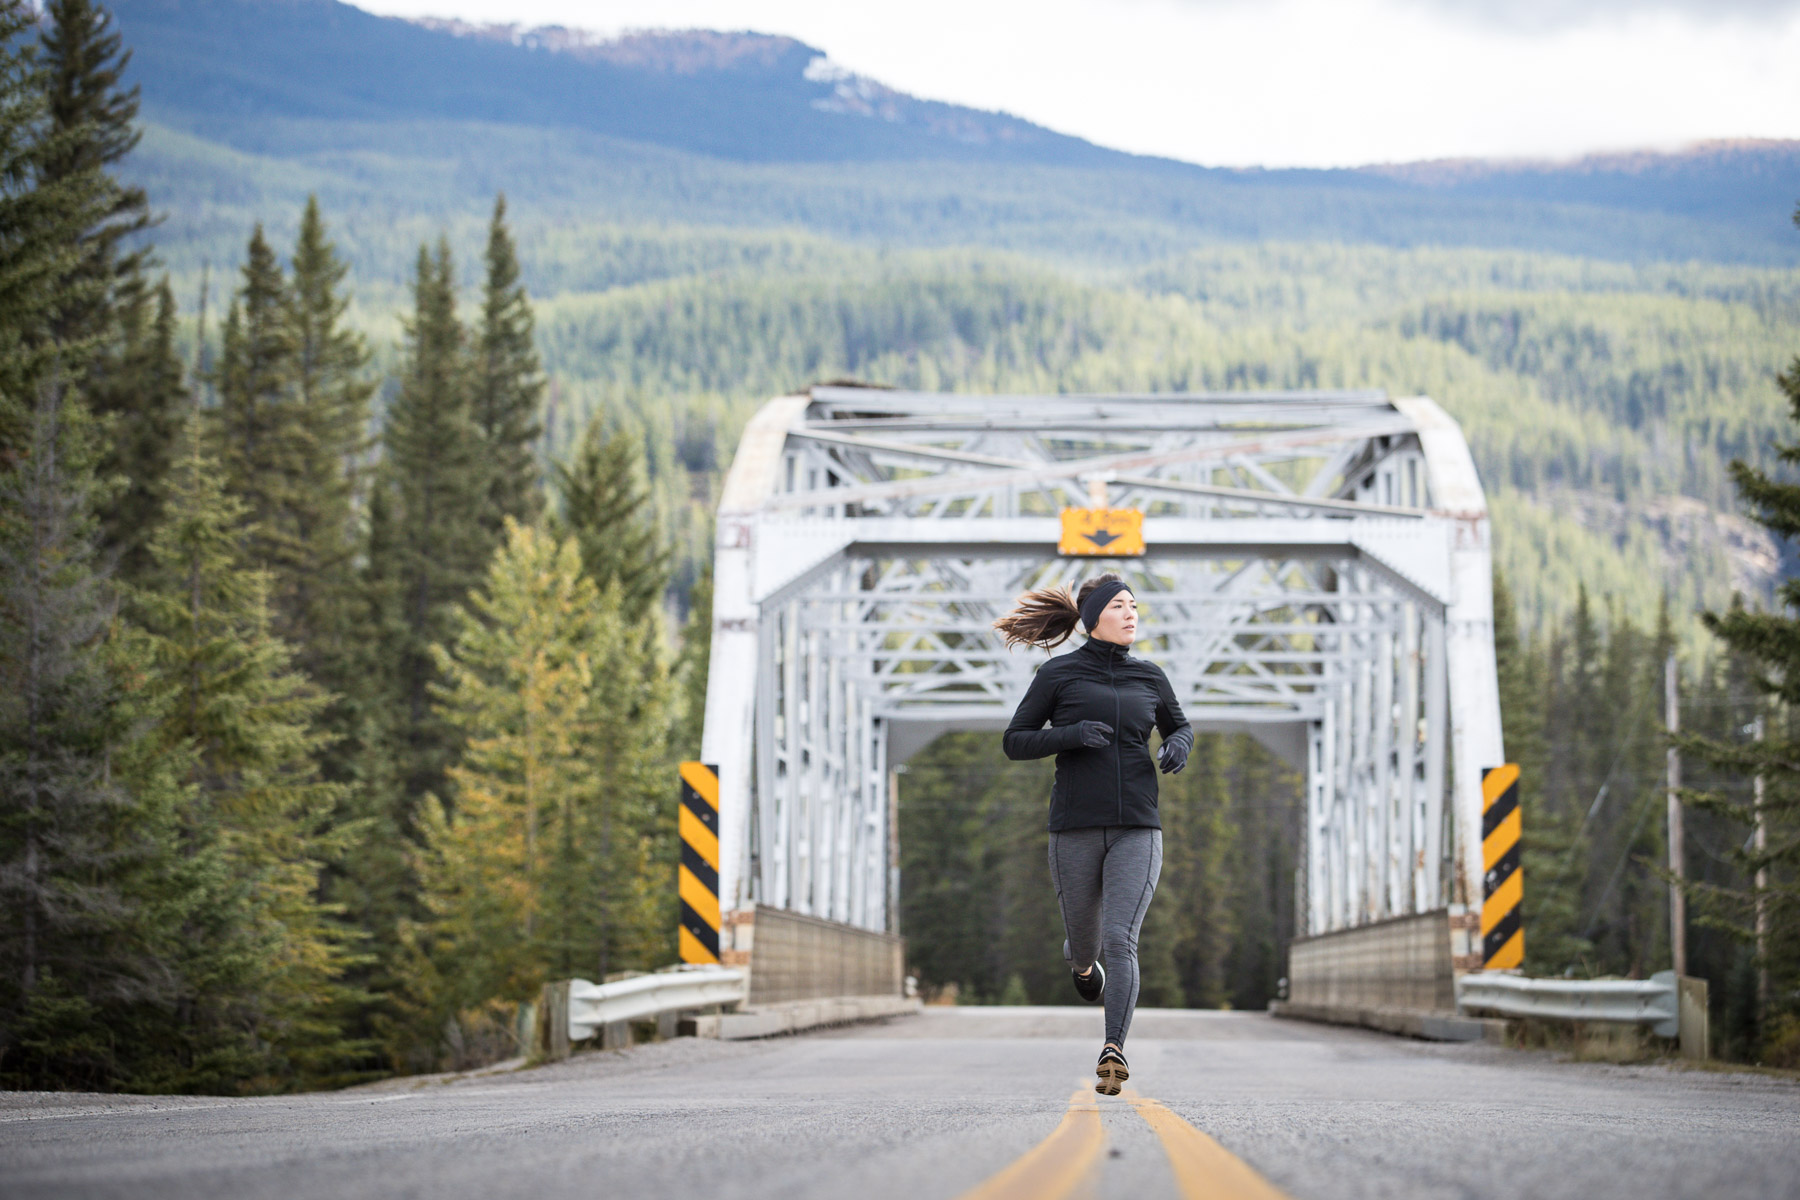 Ashley Barker LuluLemon Banff Bridge Photography Running Evergreens Road Canmore